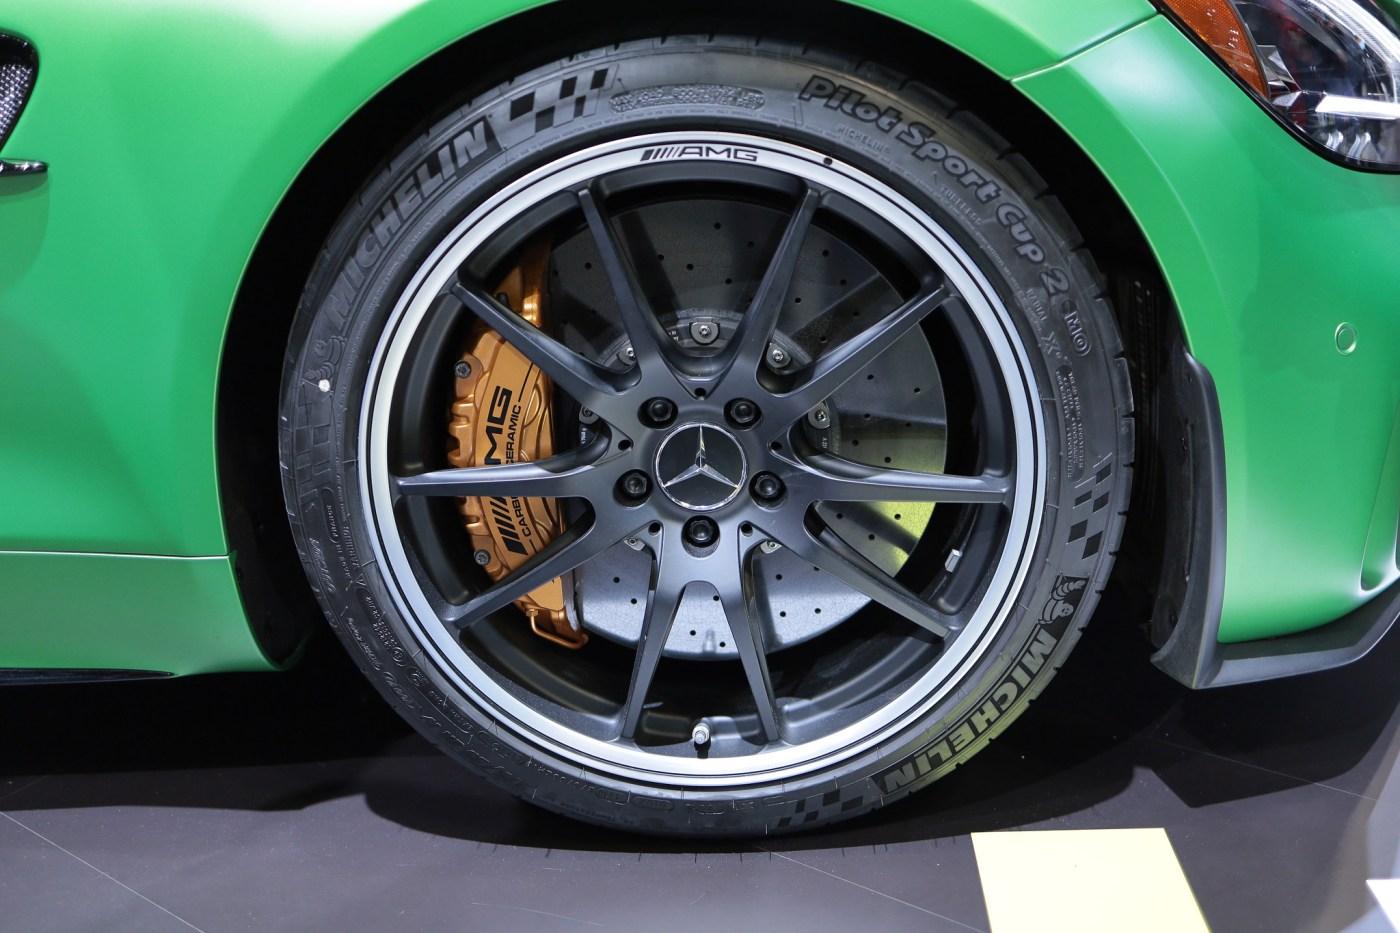 Mercedes AMG Wheel with carbon ceramic brakes